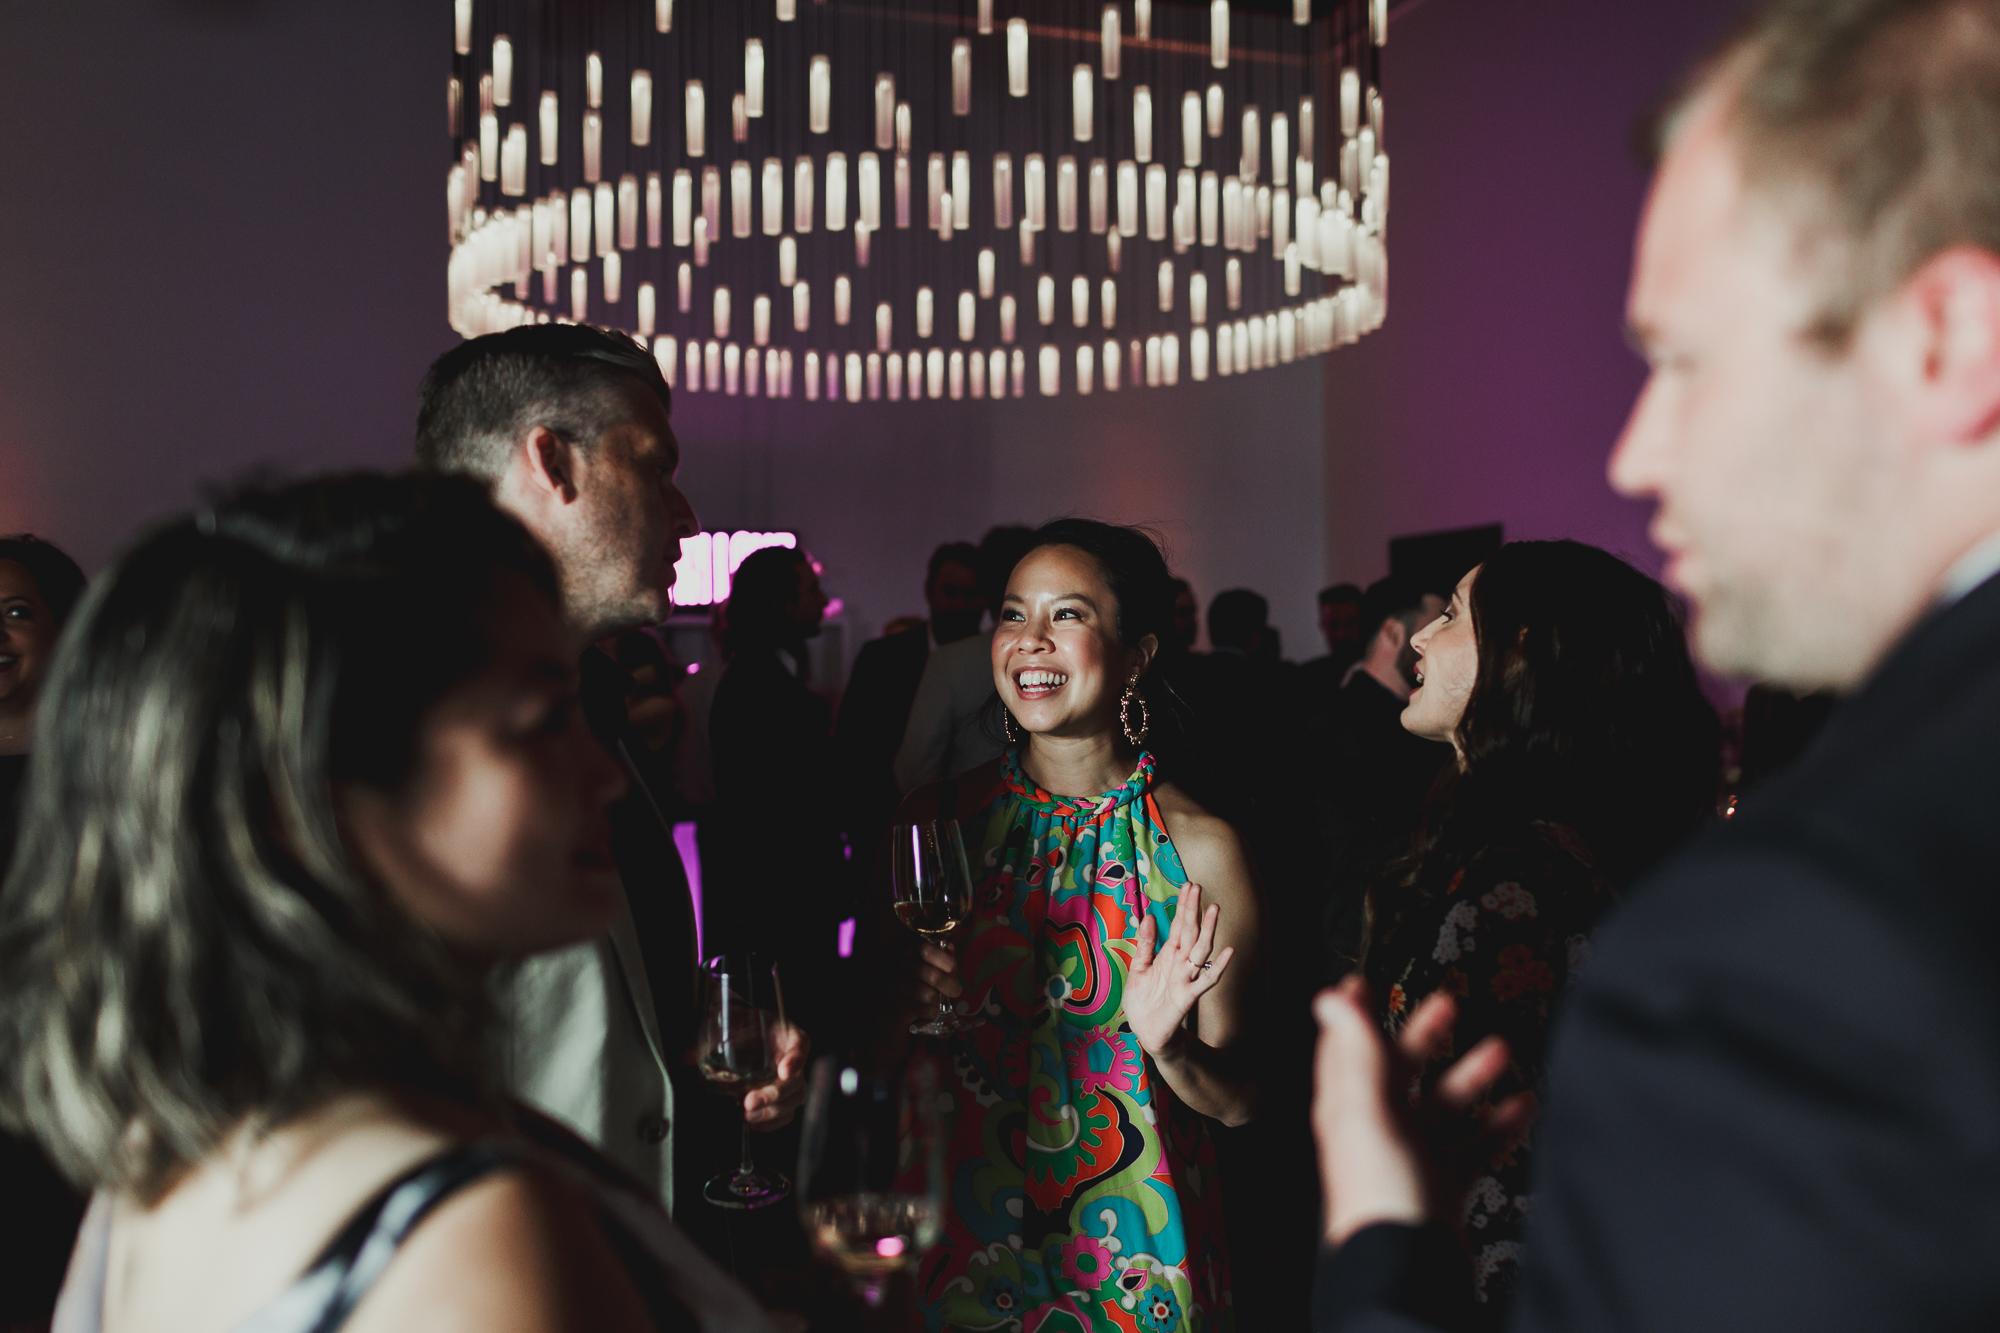 canvas event space wedding photos by Krista Welch-0074.jpg